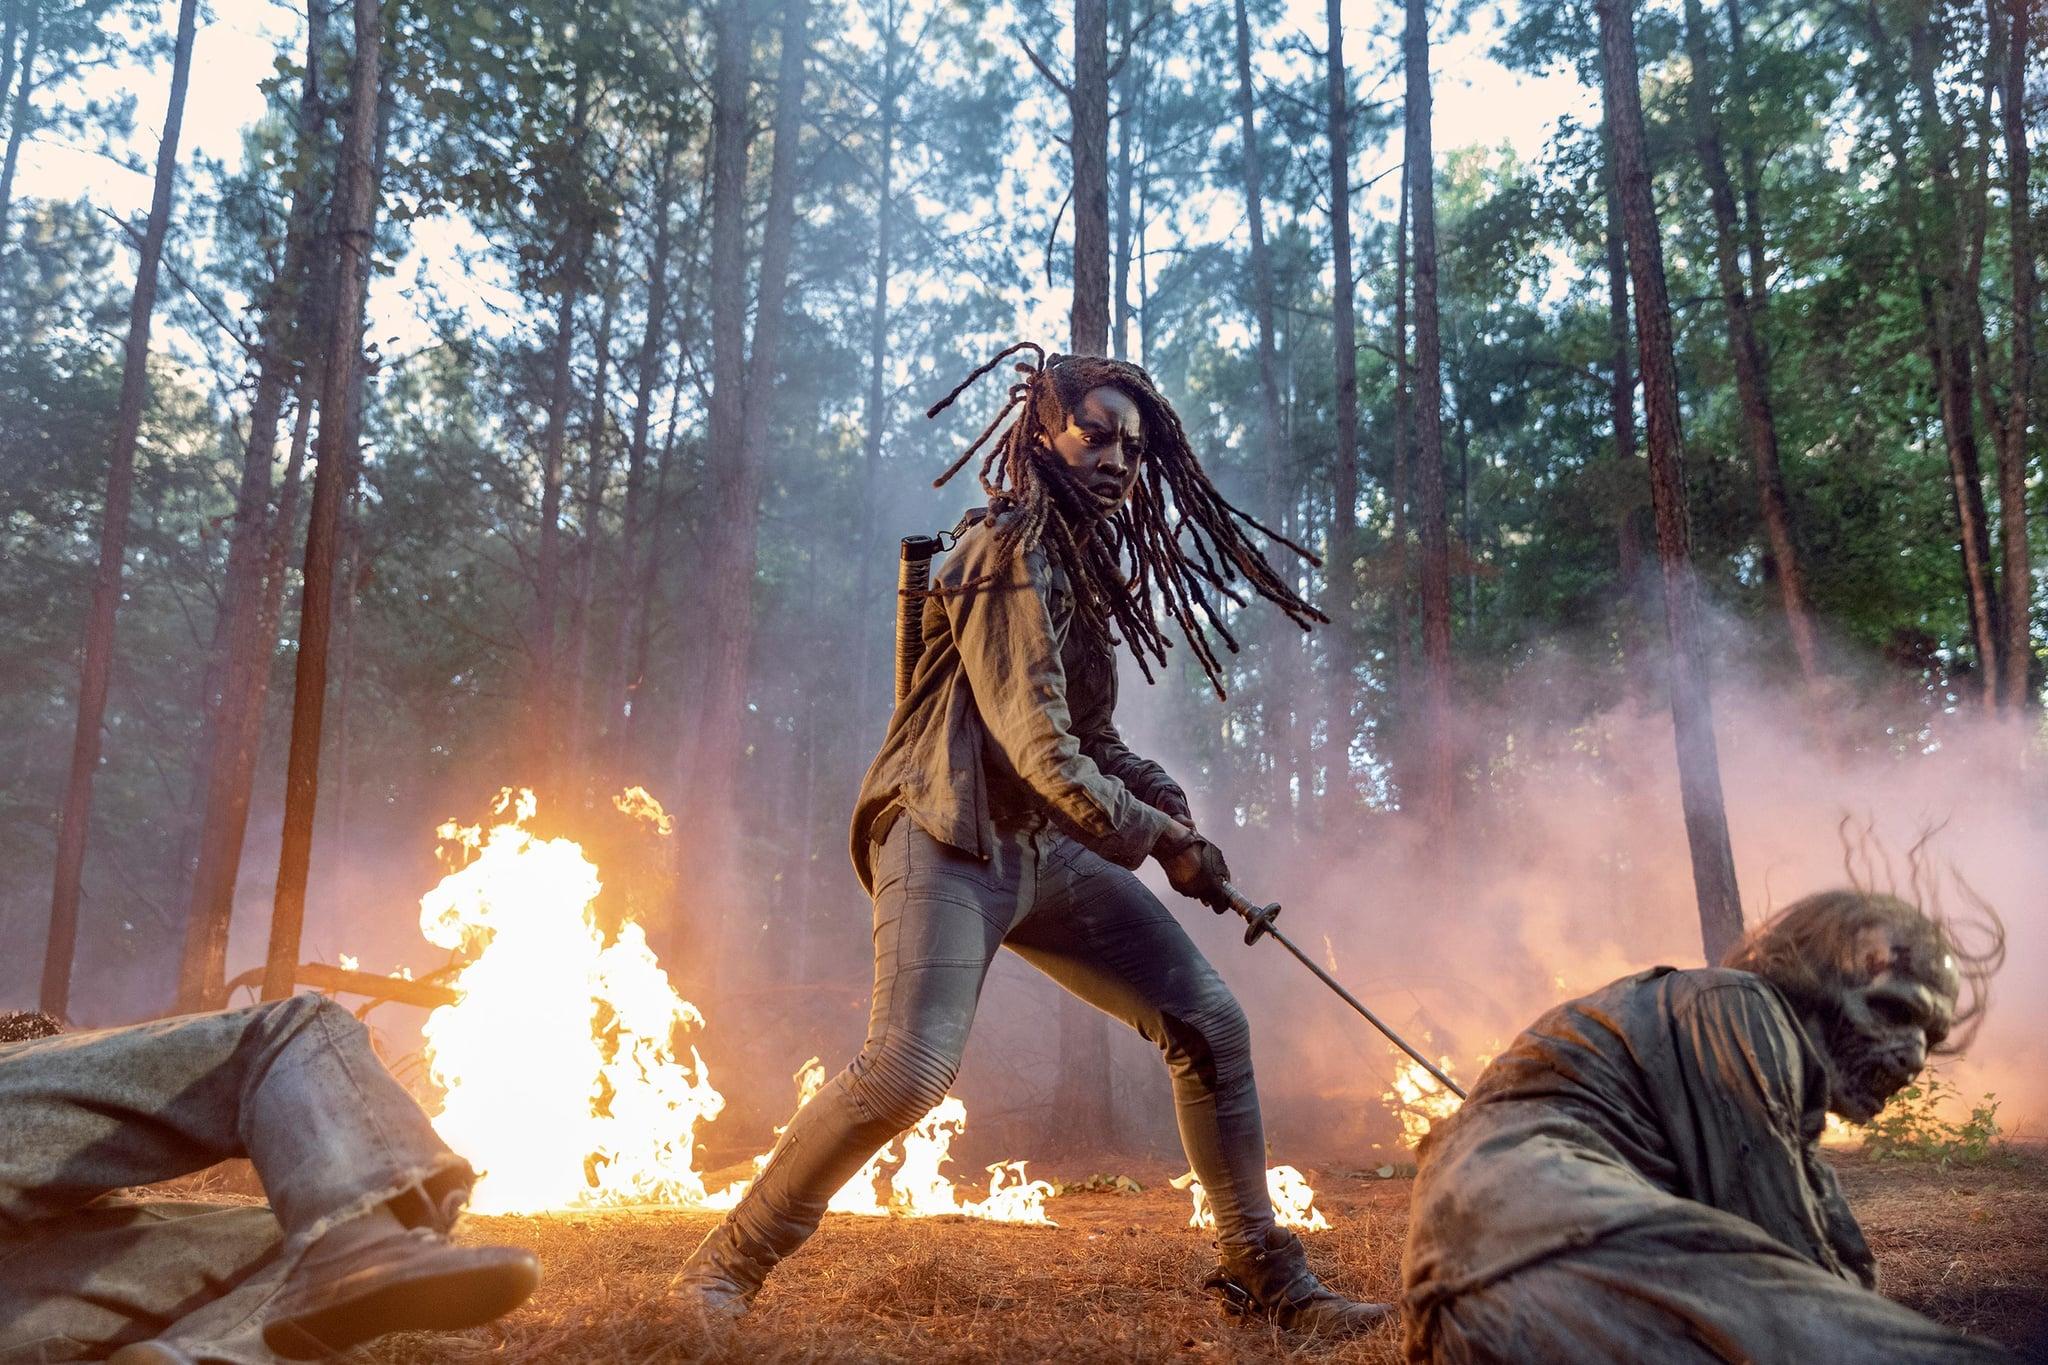 Danai Gurira as Michonne; group - The Walking Dead _ Season 10 - Photo Credit: Jackson Lee Davis/AMC